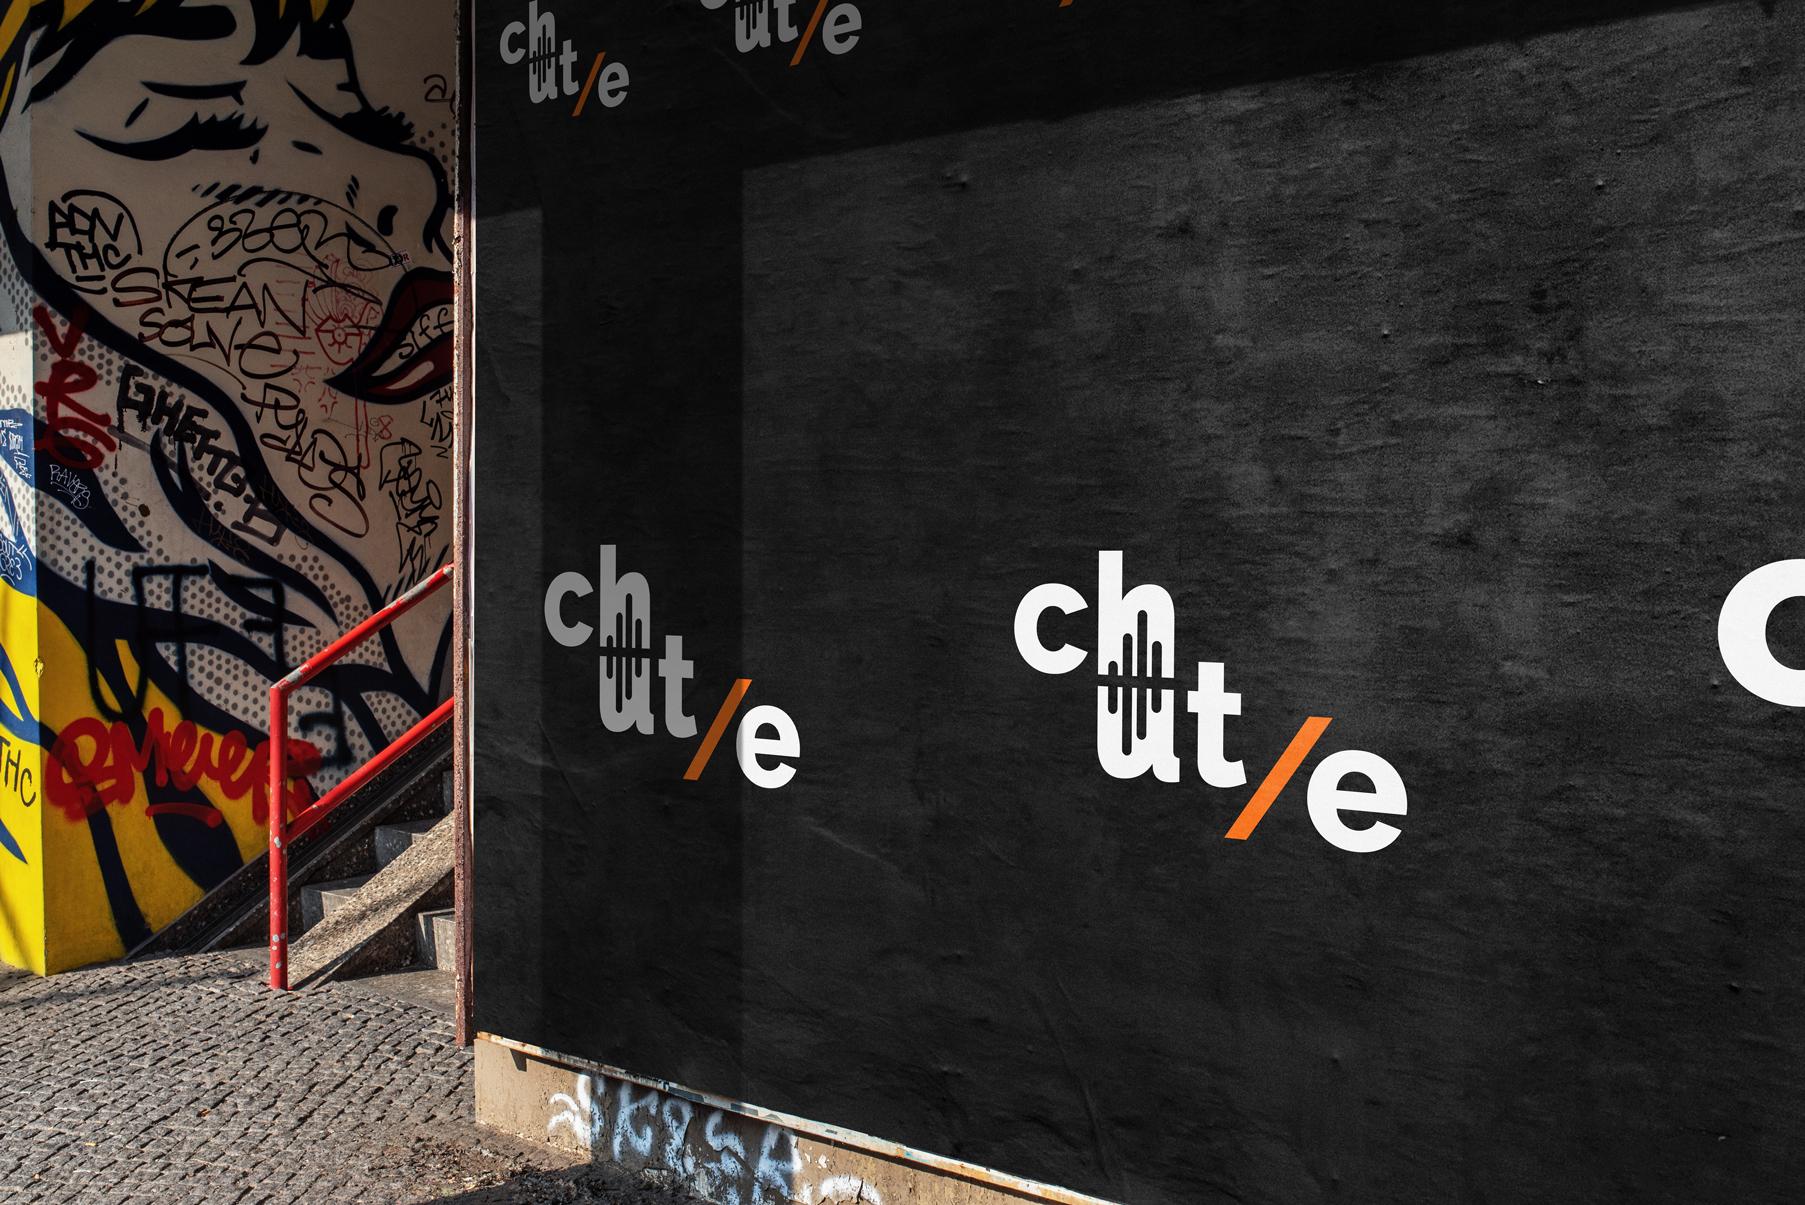 chute_logo_poster